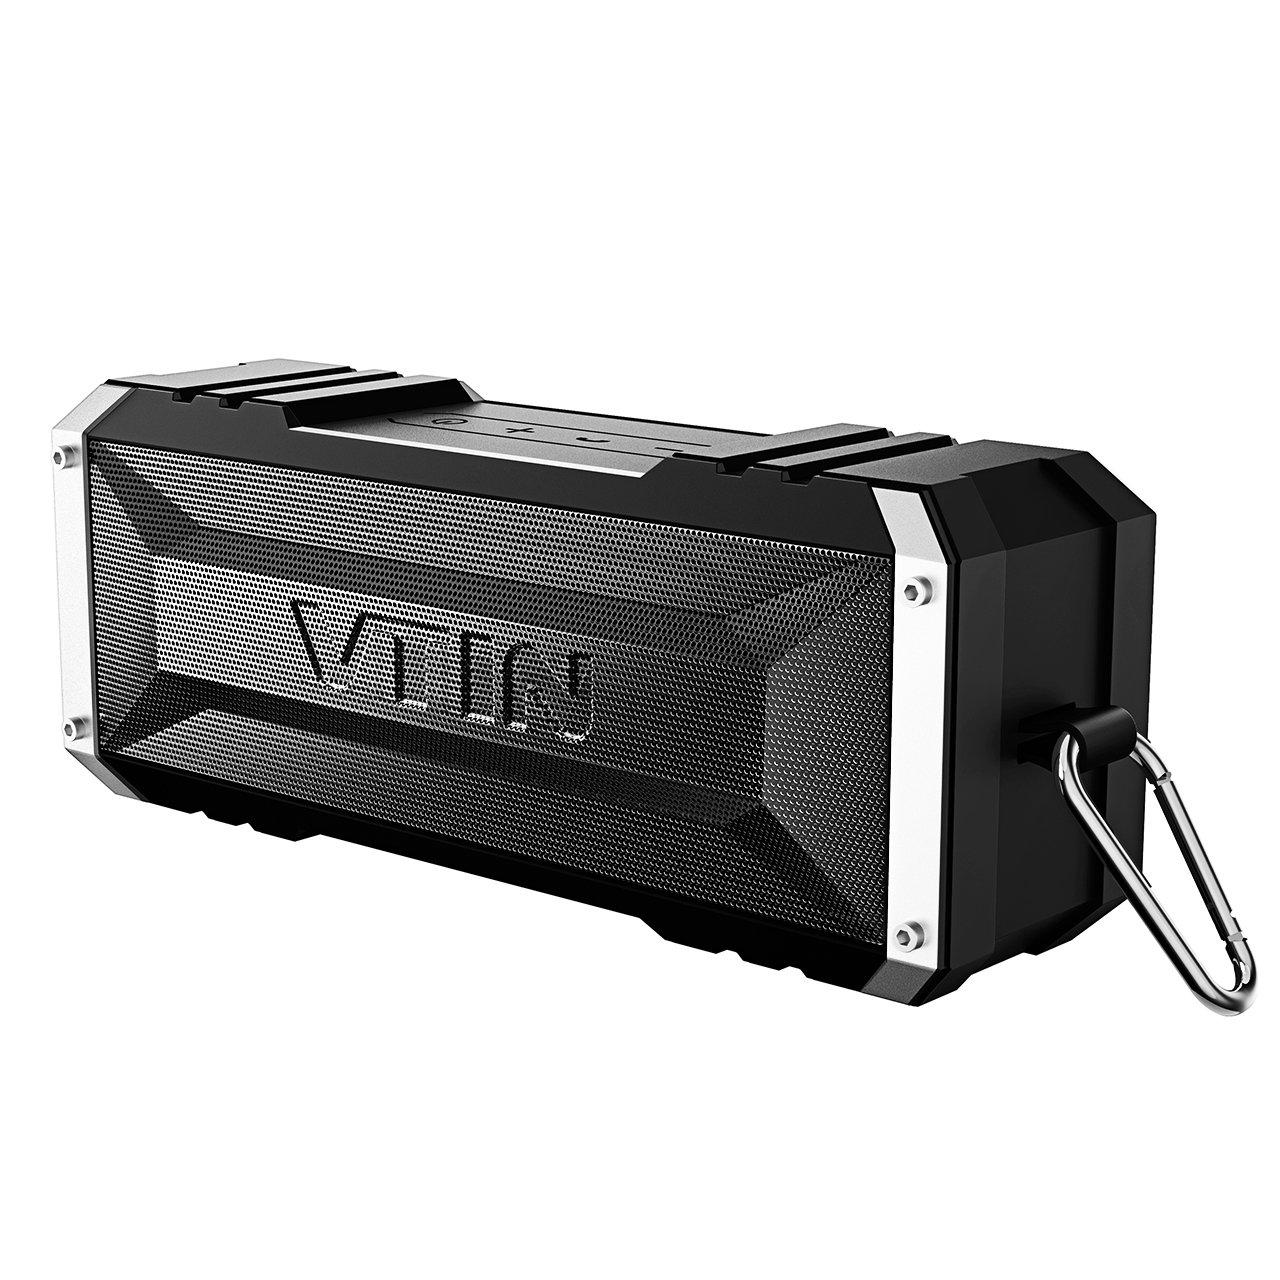 Vtin 20 Watt Waterproof Bluetooth Speaker, 25 Hours Playtime